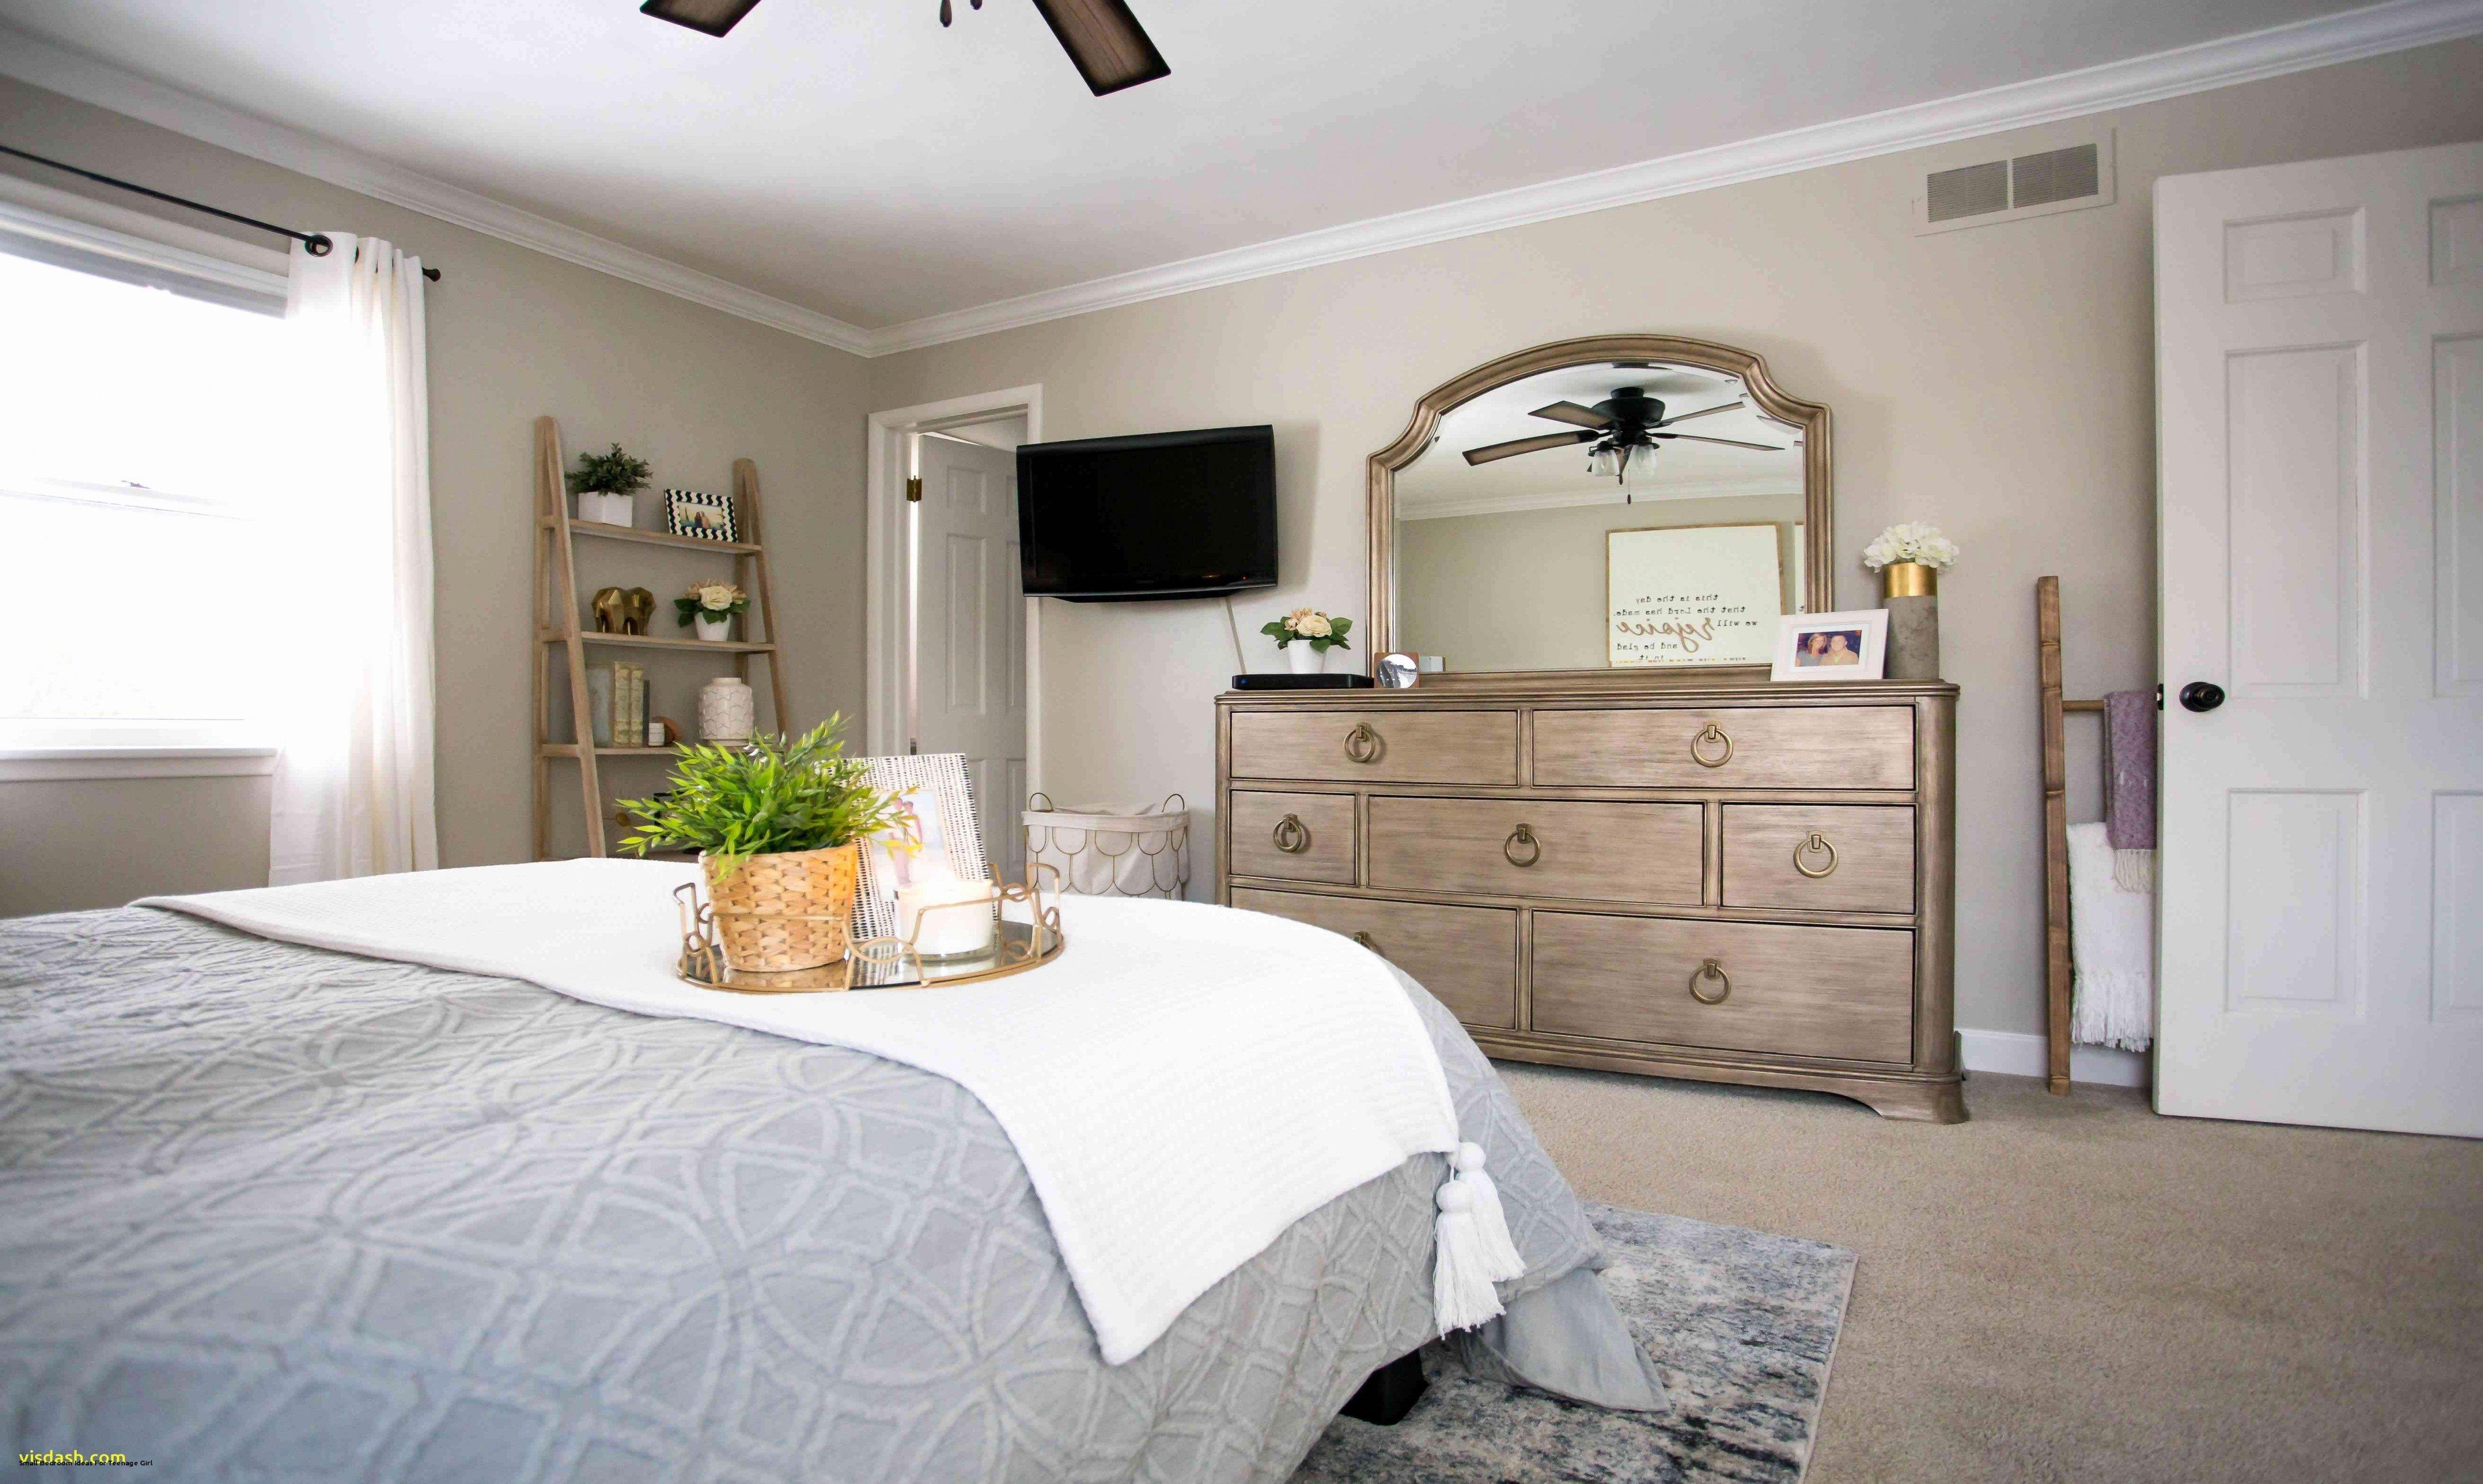 Girls Teenagers Bedroom Ideas Elegant Teen Girls Bedroom Ideas 49 Inspirational Bedroom Ideas for